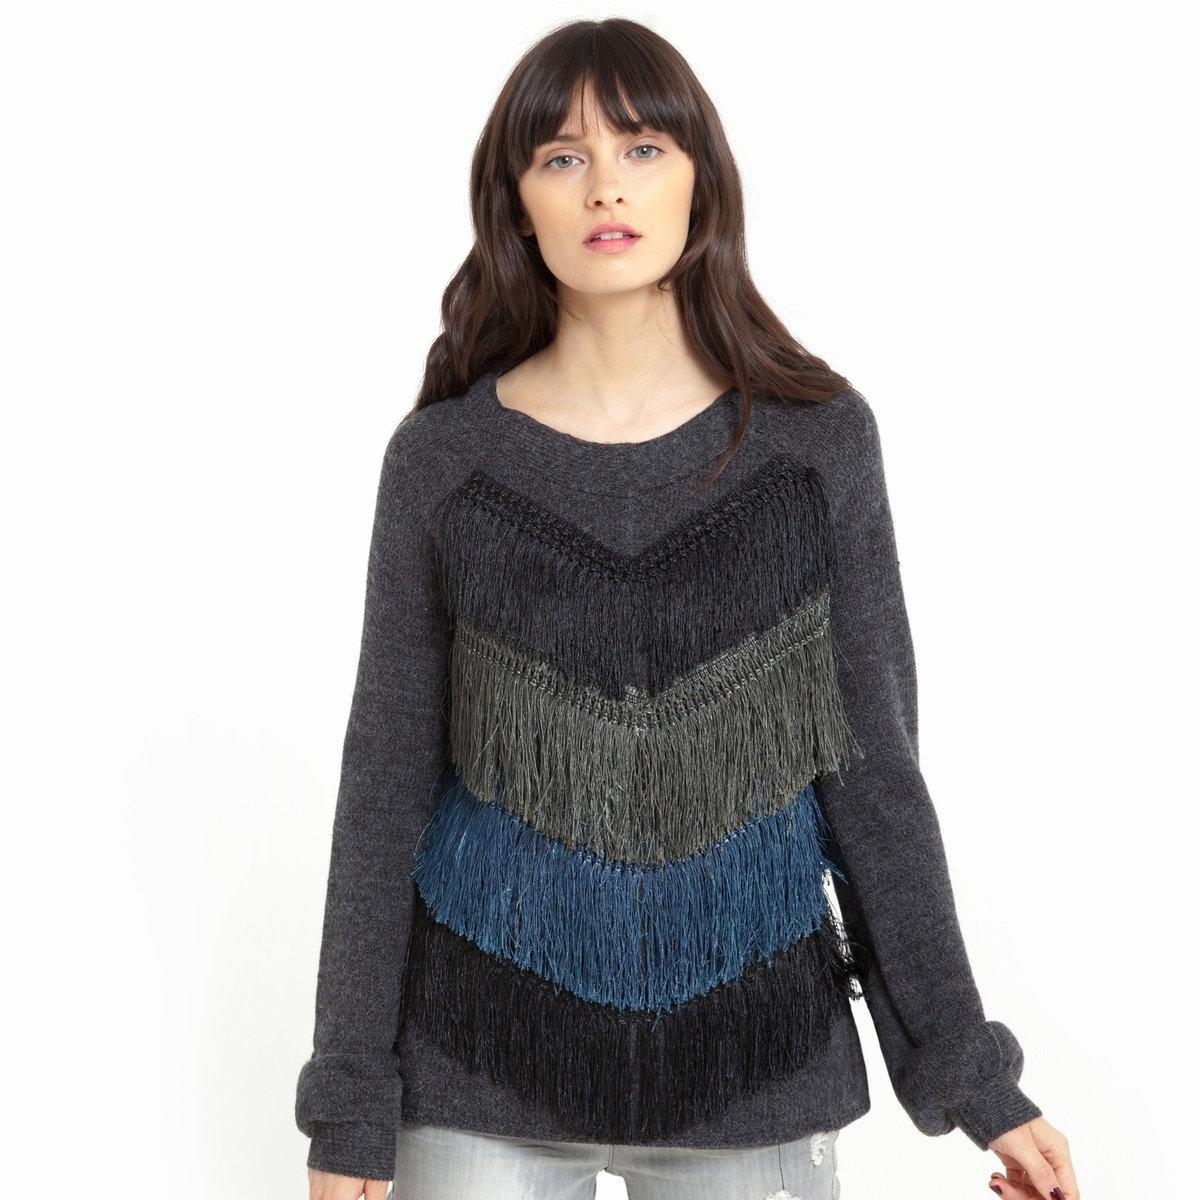 Пуловер из трикотажа с V-образным вырезом и бахромой спереди 11 teplyh istorii iz detstva v kotoroe tak hochetsia vernytsia